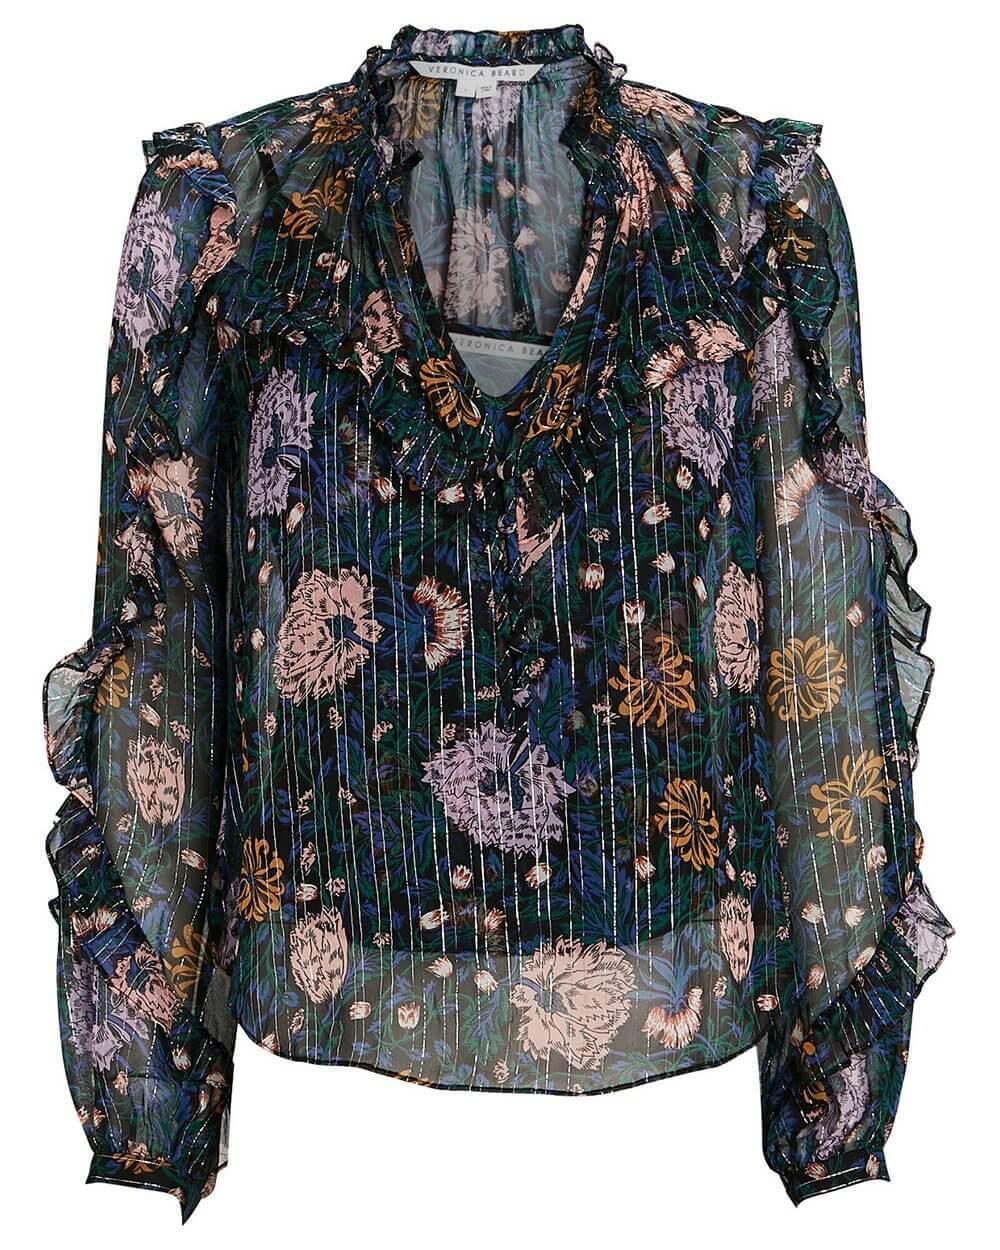 Abra Floral Blouse Item # 2012CHF0104977